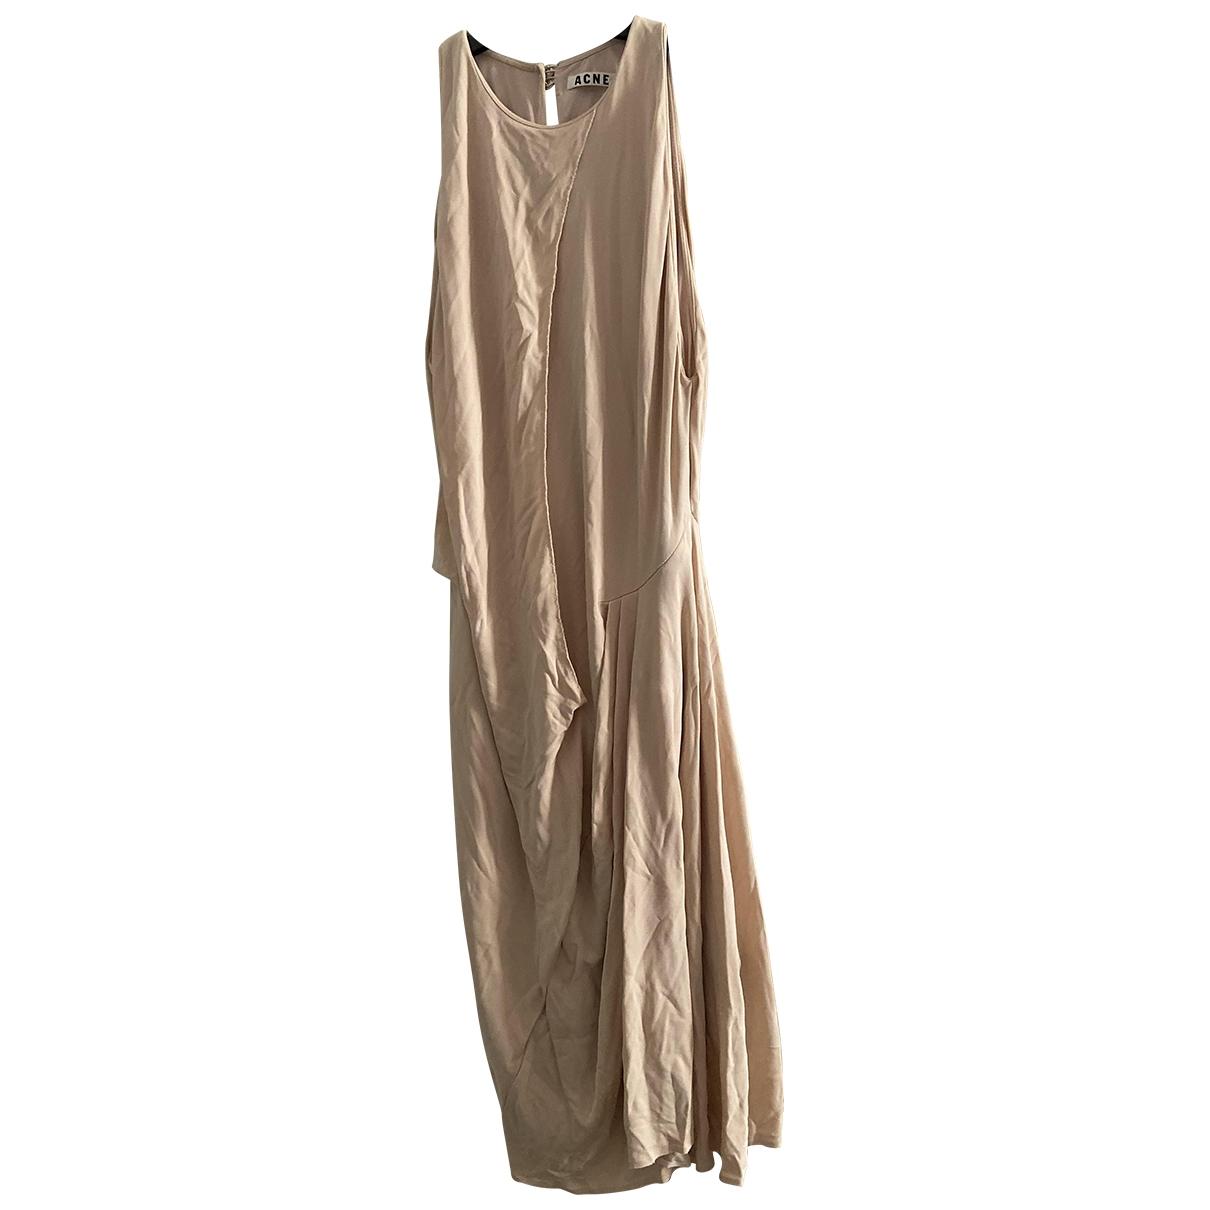 Acne Studios \N Beige dress for Women M International